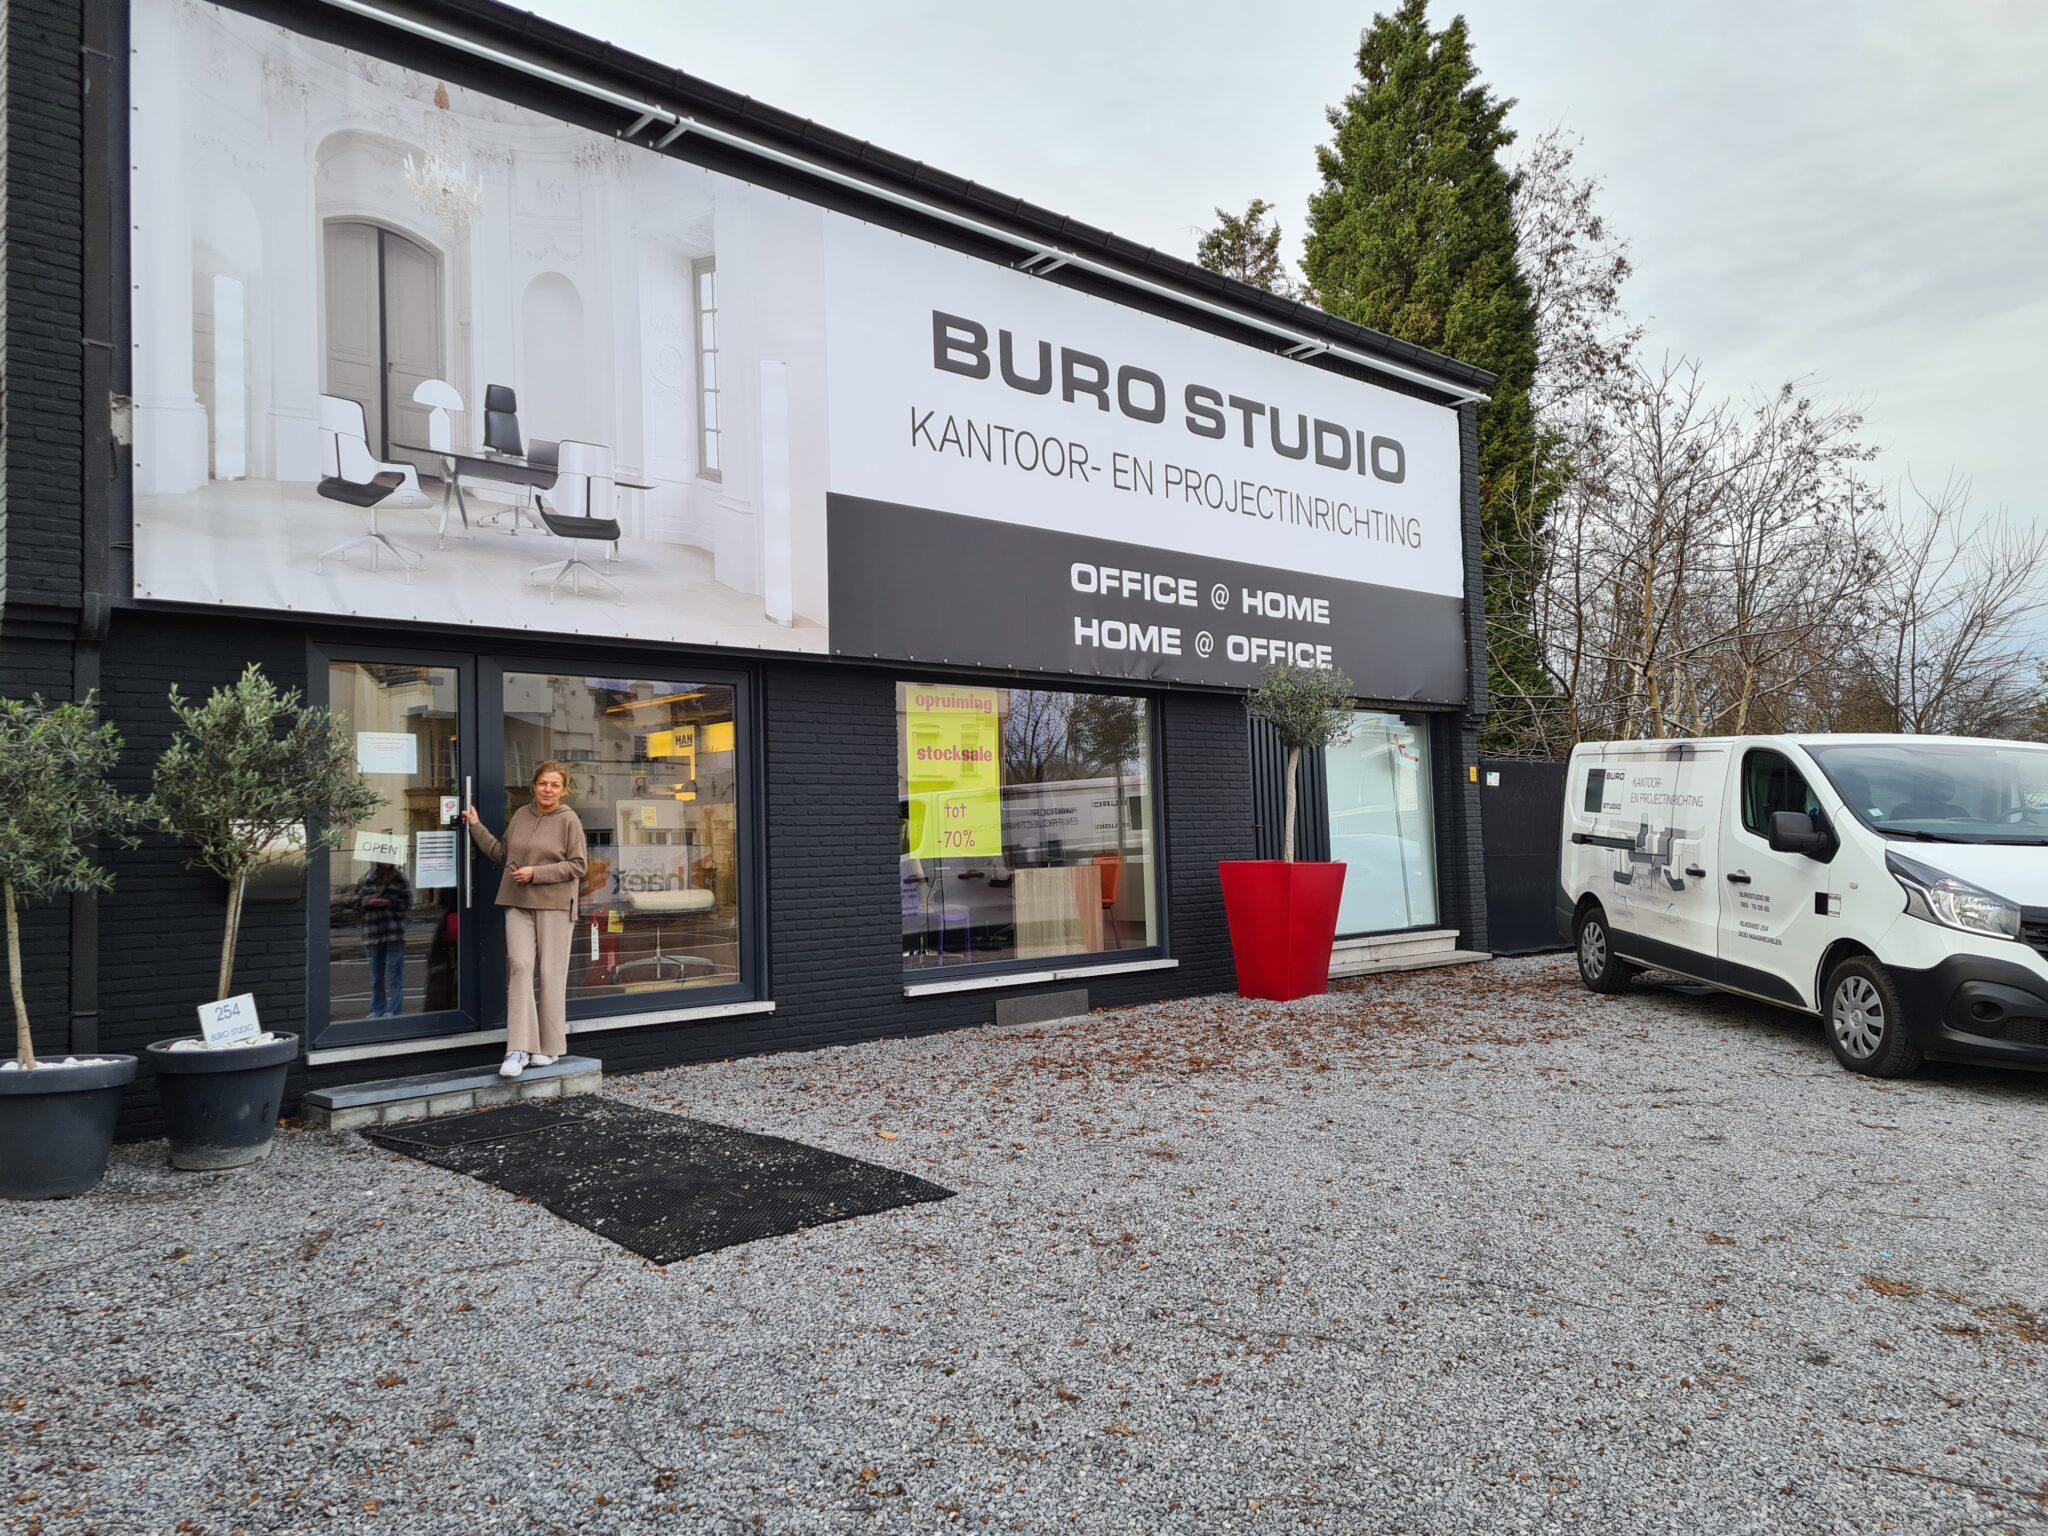 BURO STUDIO Buitenreclame